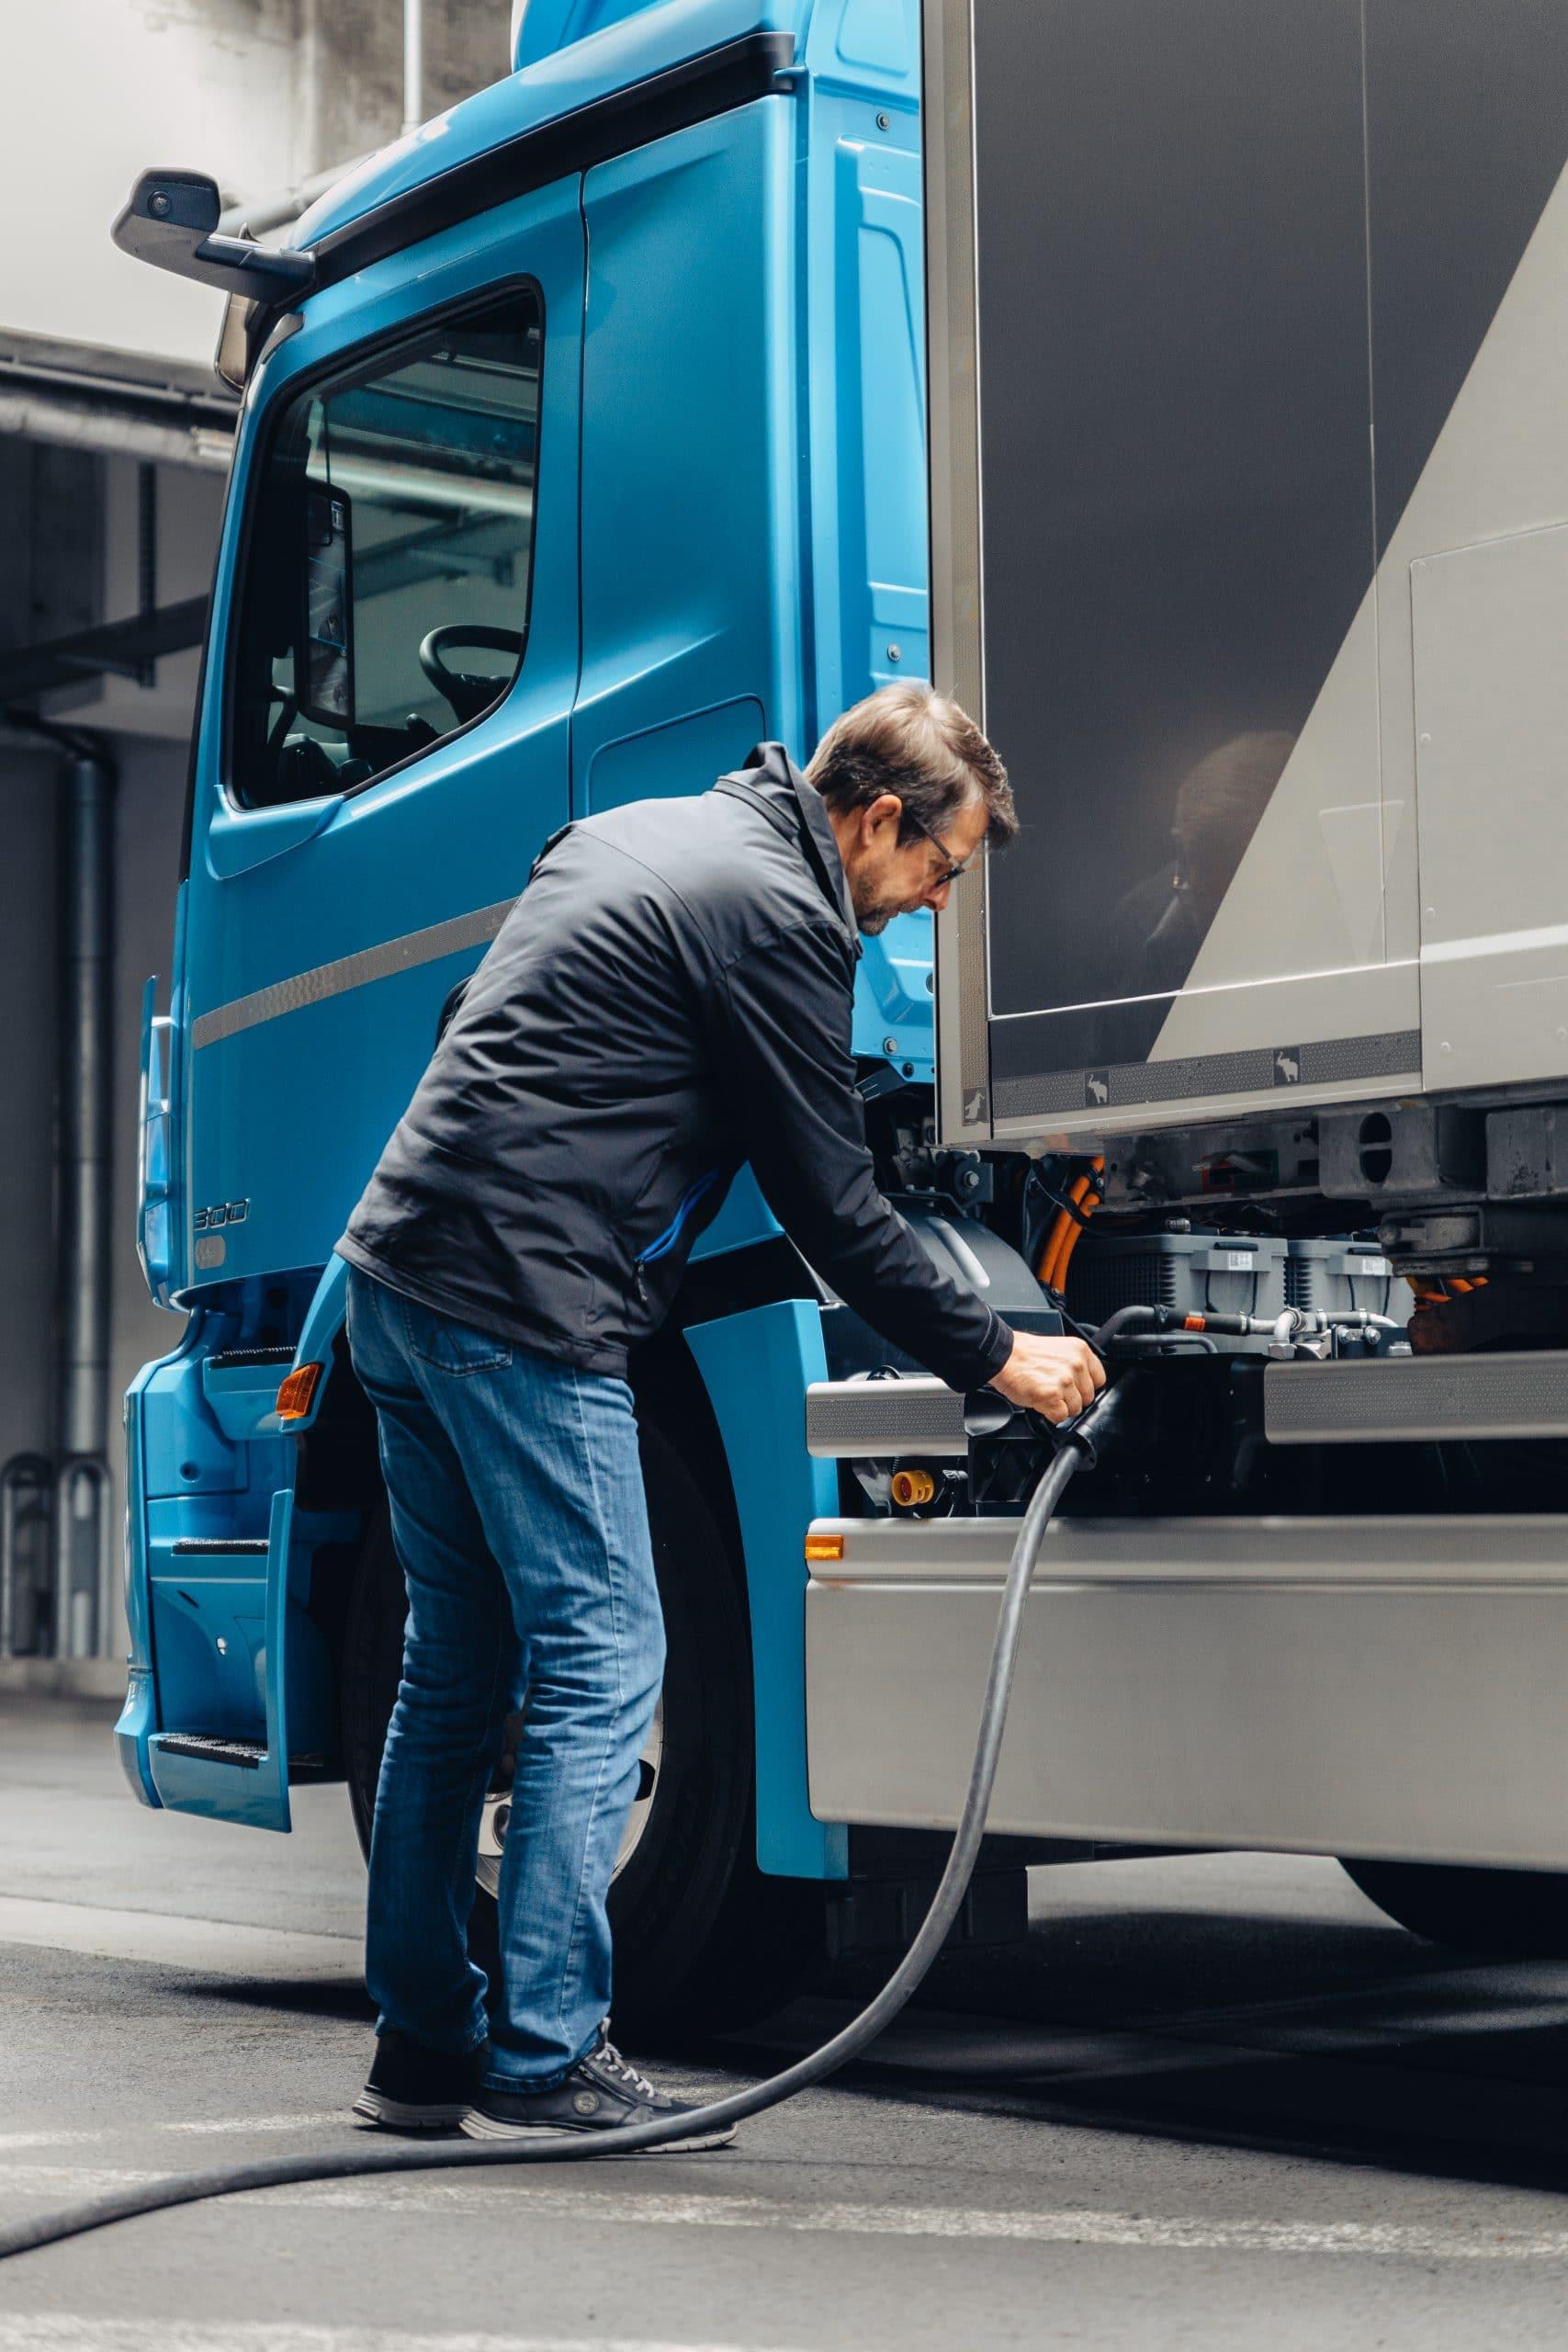 21C0349 011 scaled Το νέο eActros, γίνεται σημείο αναφοράς στις μεταφορές χωρίς ρύπους electric trucks, Mercedes, Mercedes Actros, Mercedes Benz, Mercedes eActros, ειδήσεις, Επαγγελματικά, ηλεκτρικά, Νέα, Φορτηγά